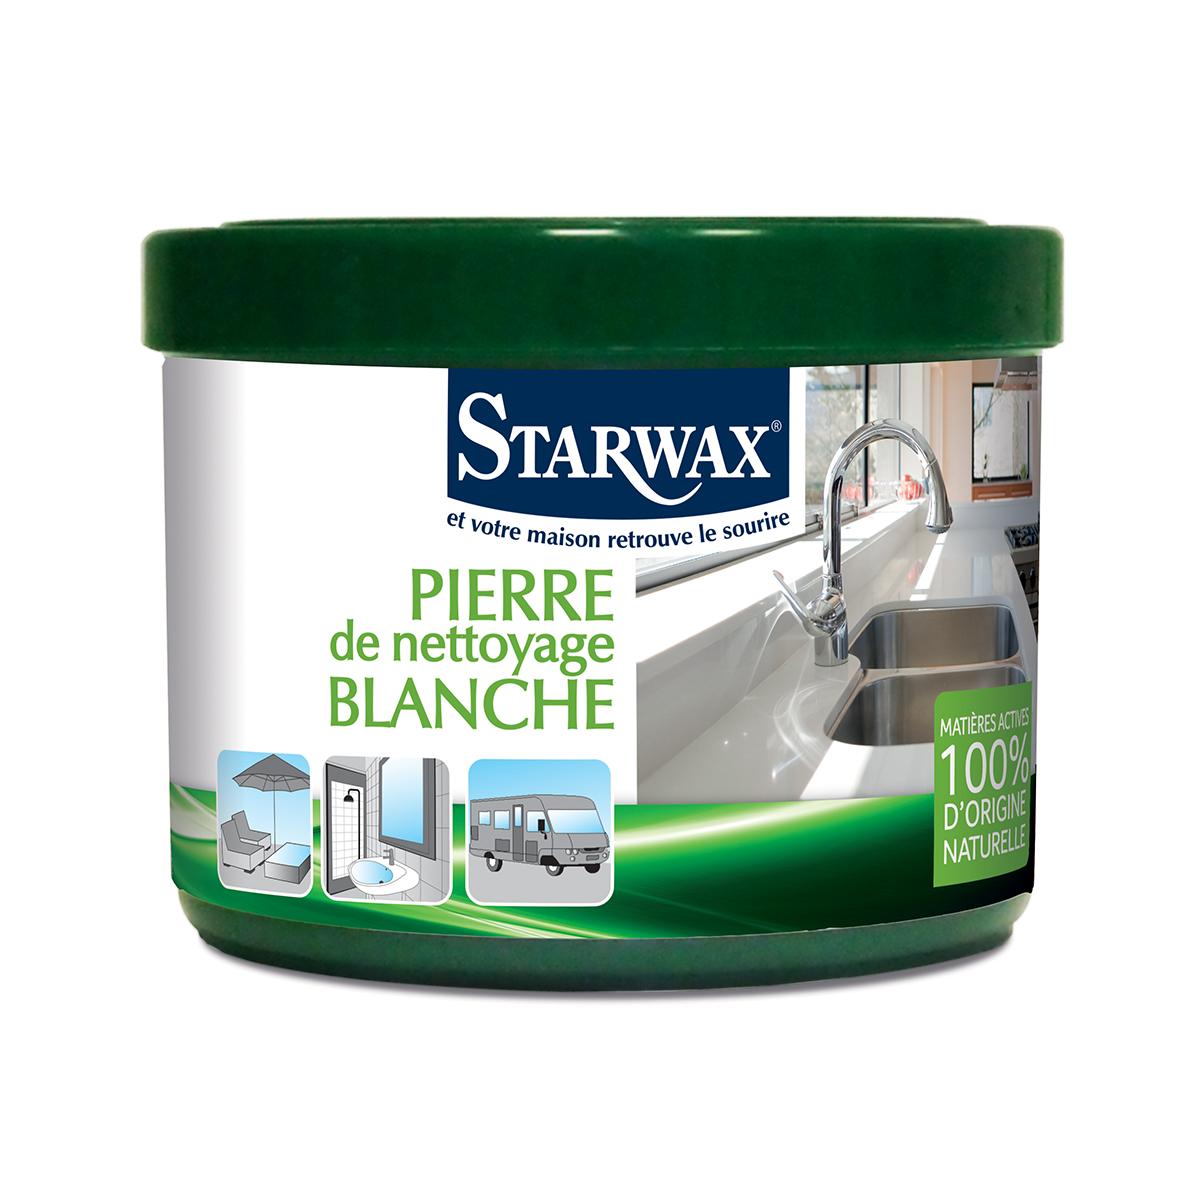 Scrub stone - Starwax